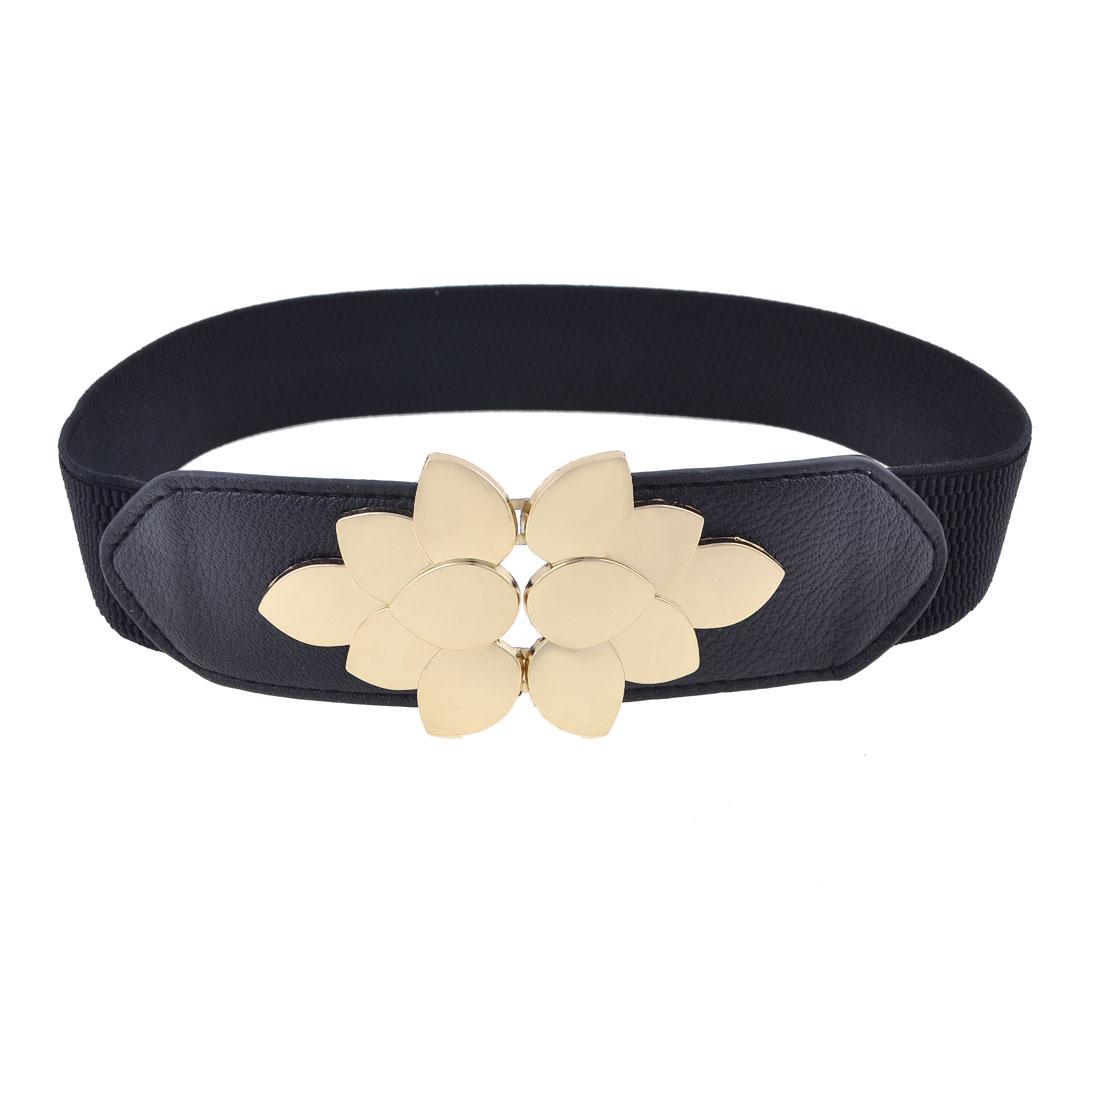 Lady Gold Tone Flower Design Metal Buckle Black Elastic Cinch Waist Belt